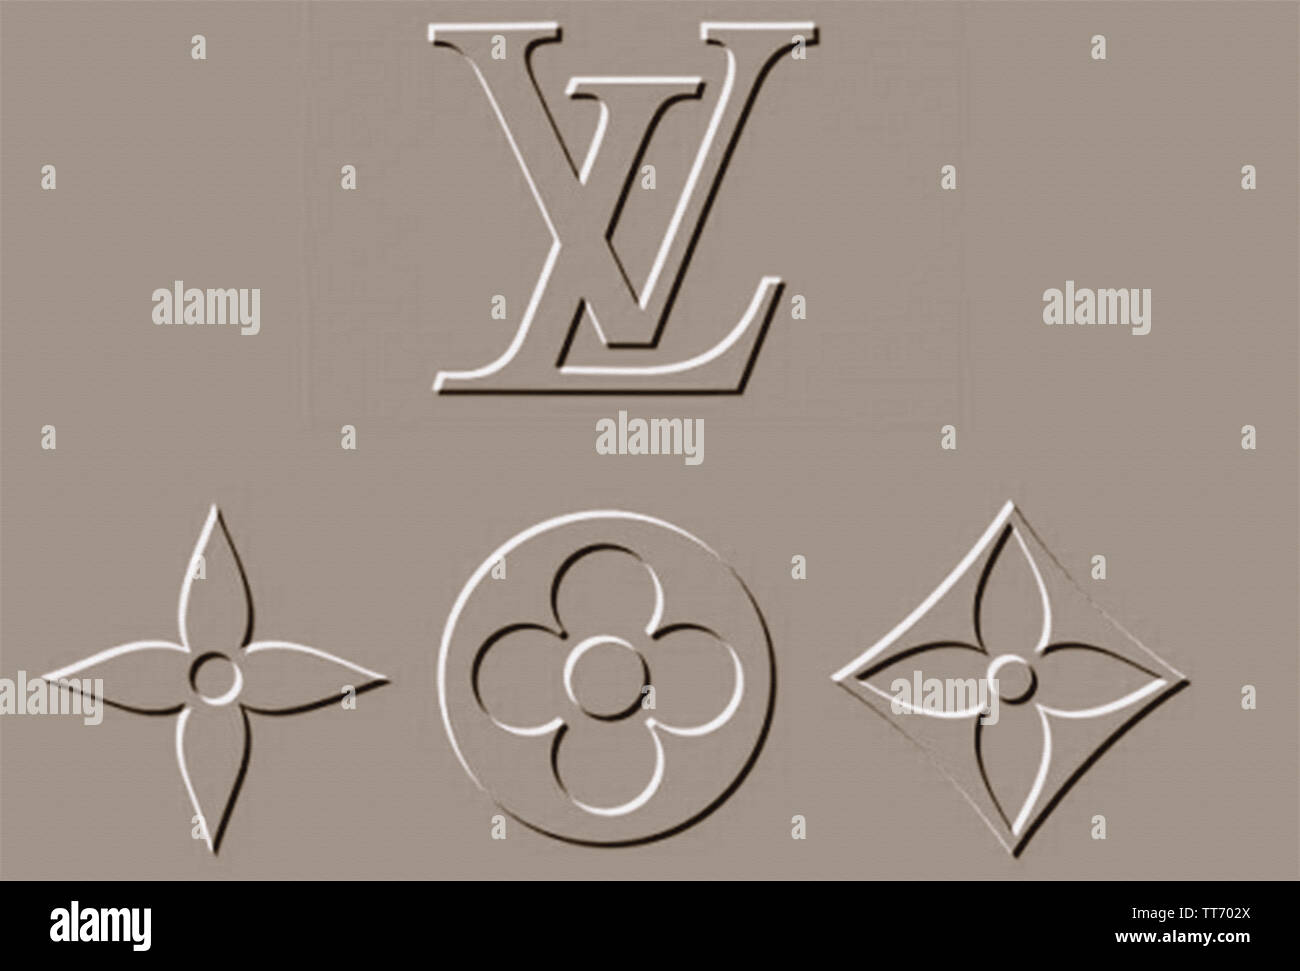 Louis Vuitton Wallpaper Background Iconic Luxury Brand Stock Photo Alamy